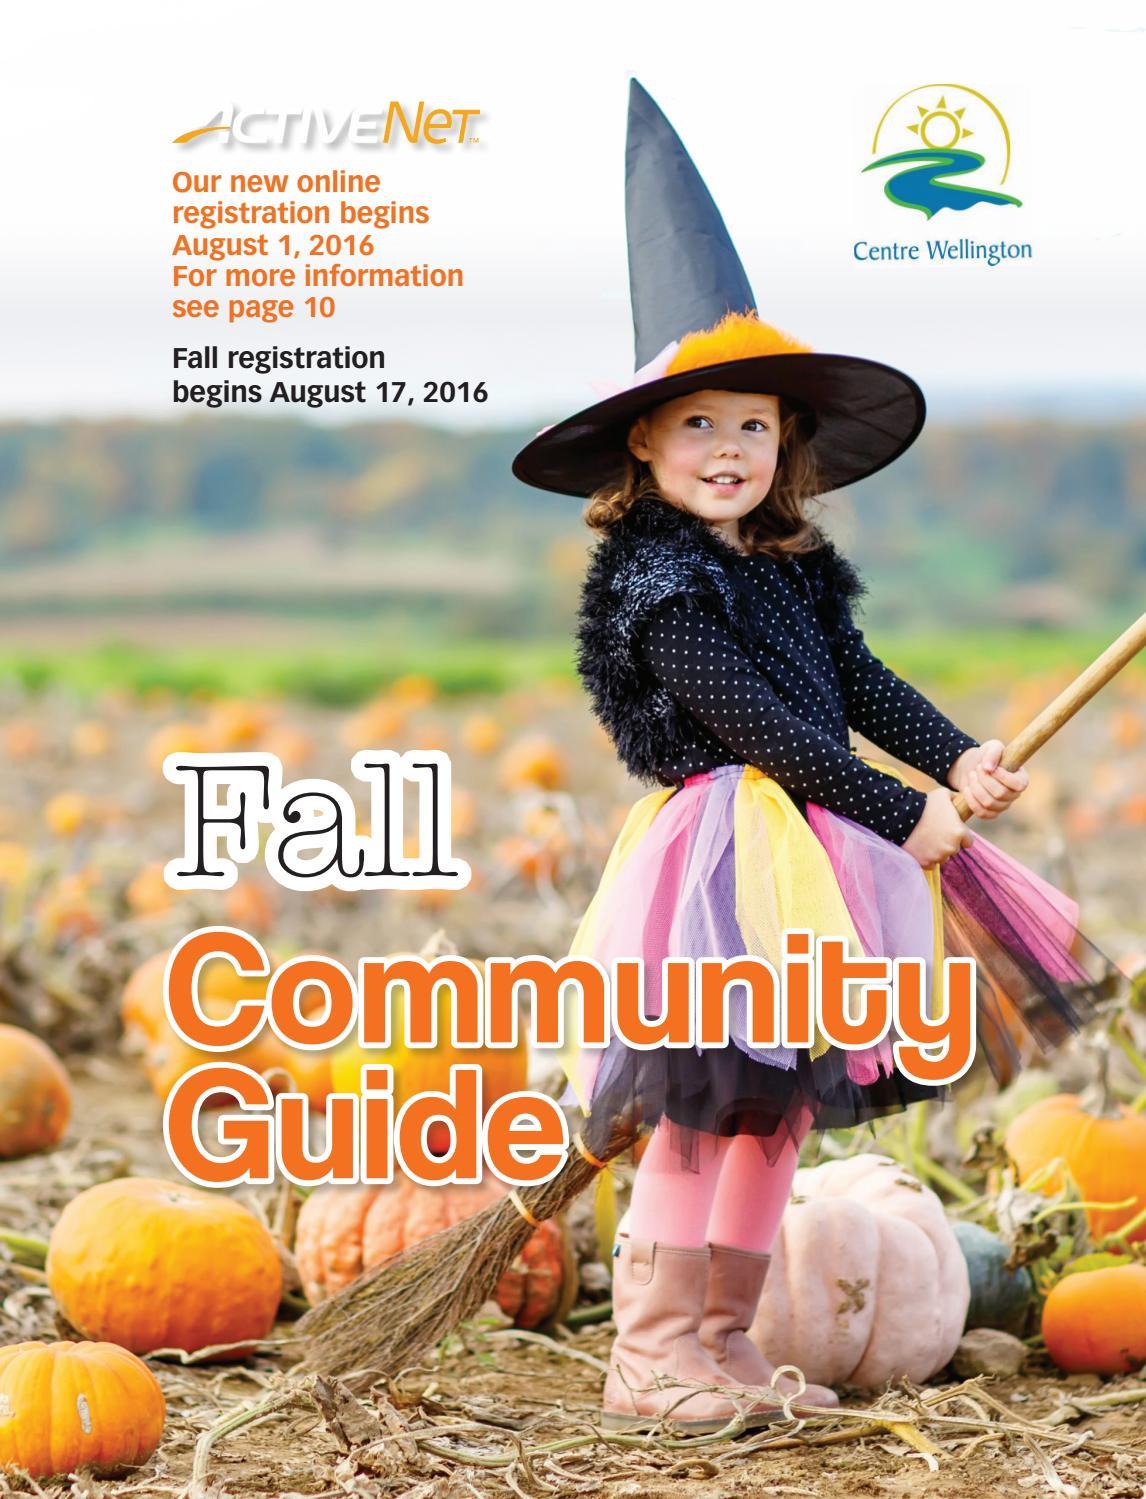 675c86fa5a8 Centre Wellington Community Guide Fall 2016 by WHA Publications Ltd ...